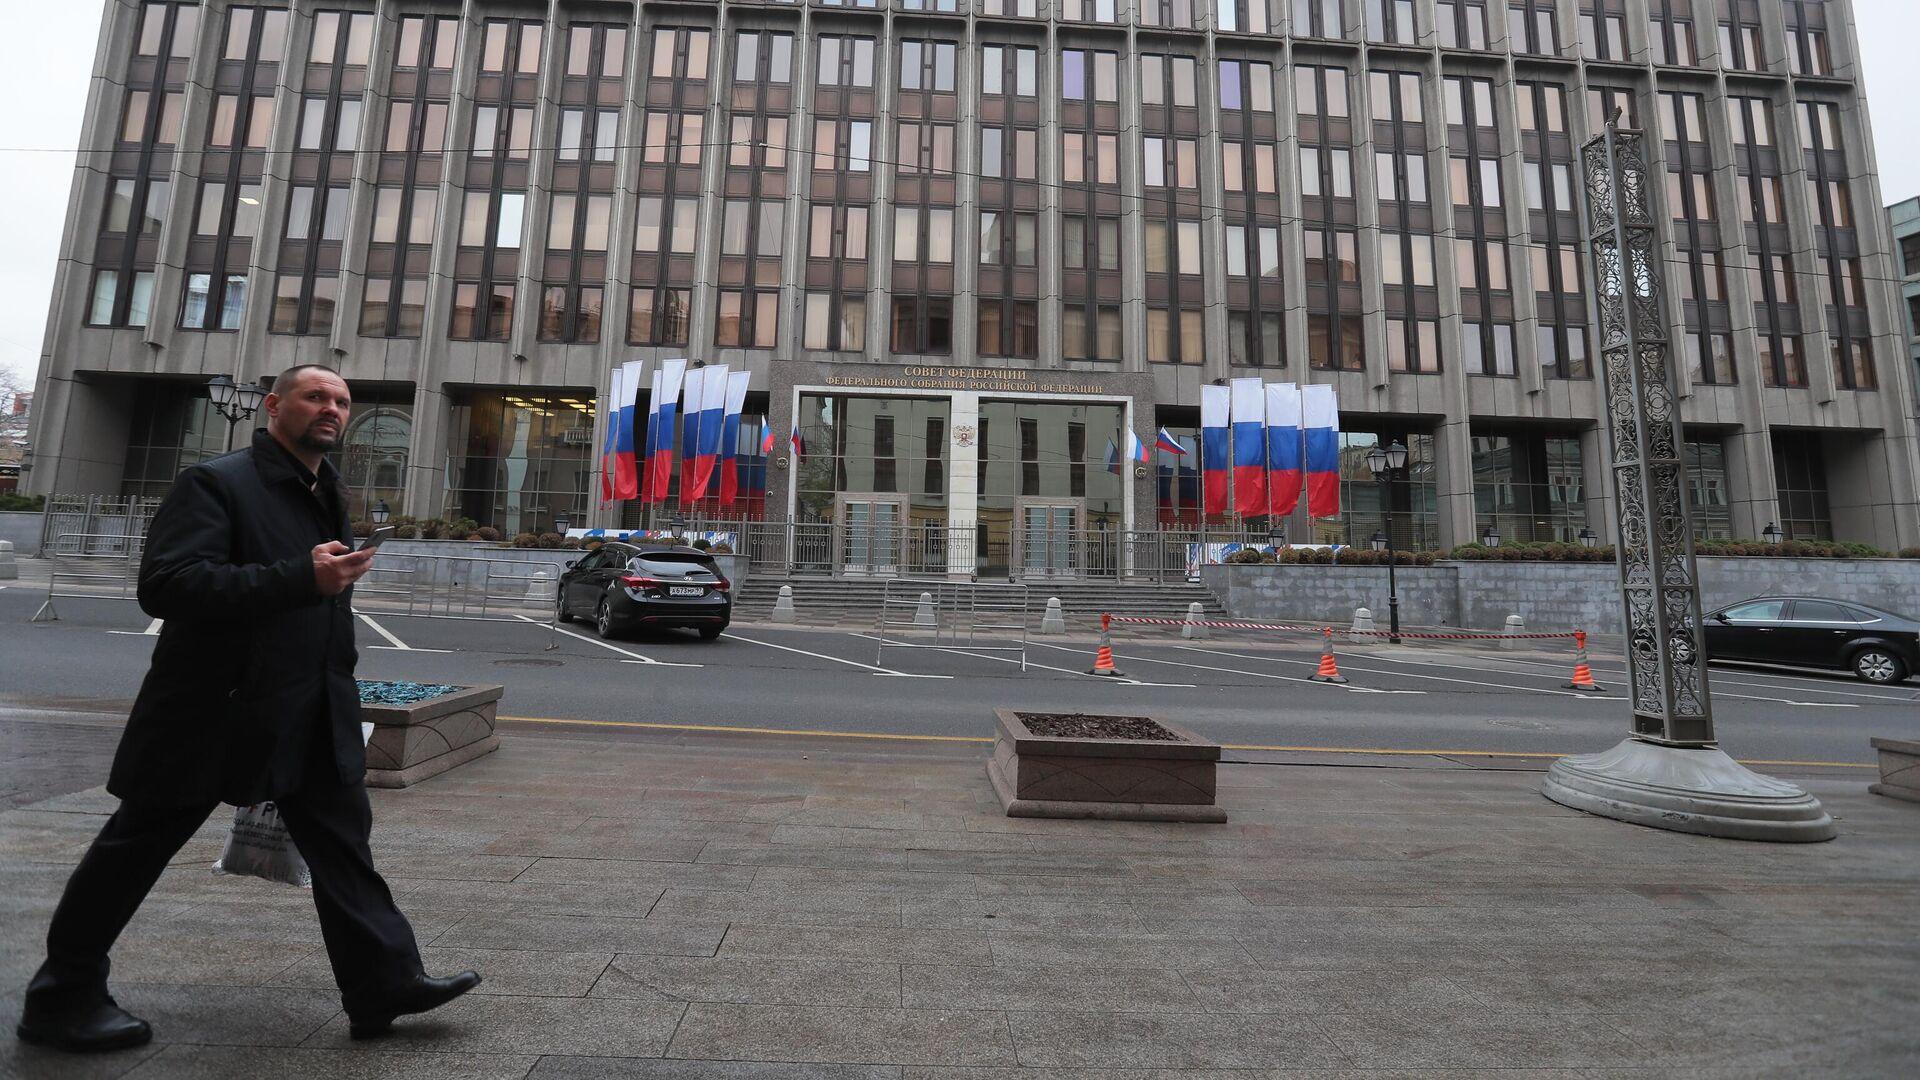 Здание Совета Федерации РФ в Москве - РИА Новости, 1920, 09.04.2021